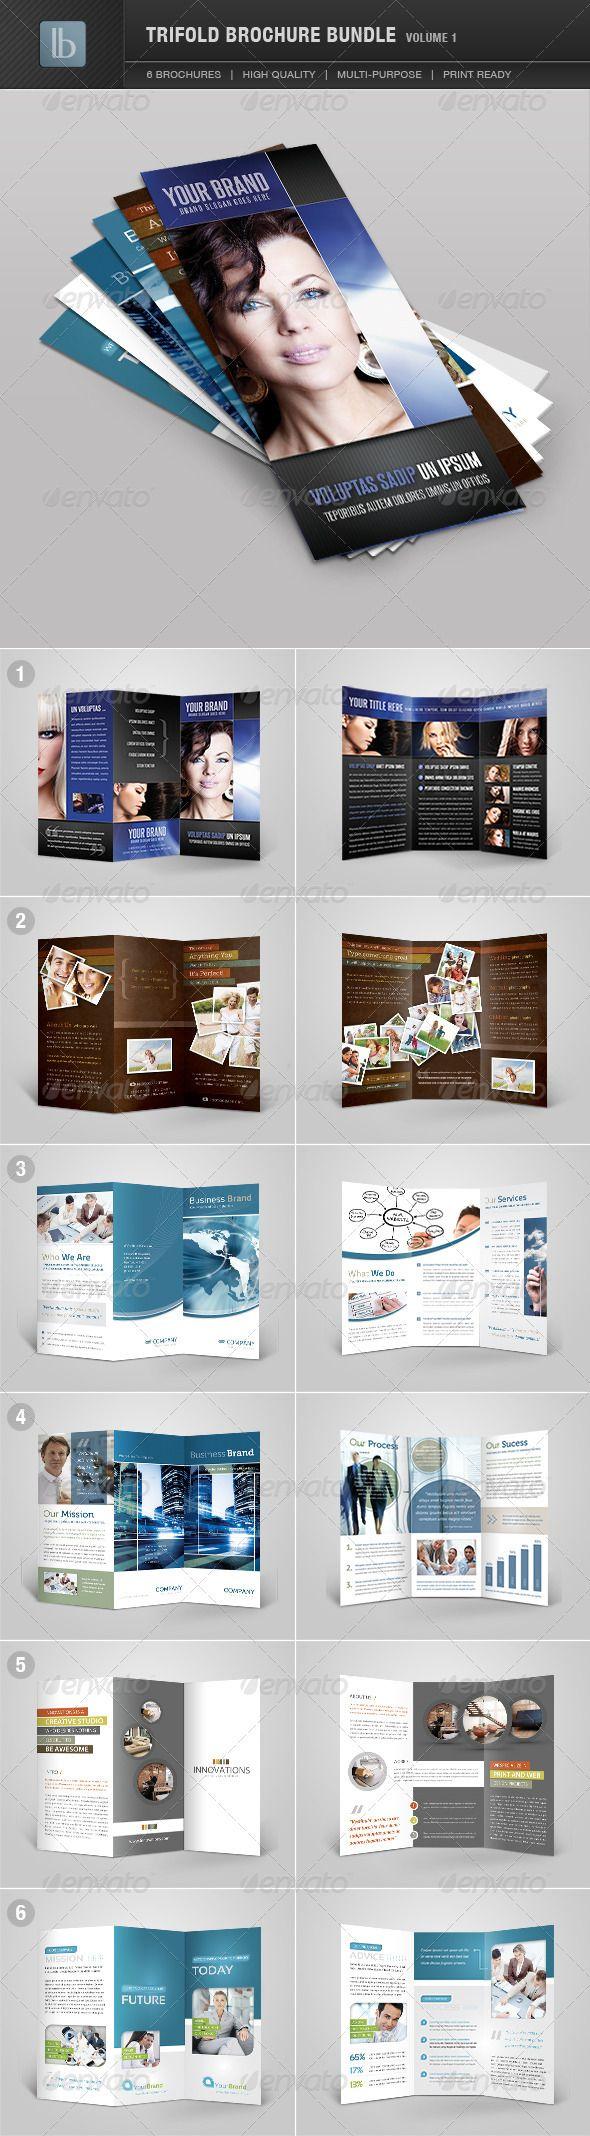 96 best print templates images on pinterest print for Vista print brochures templates